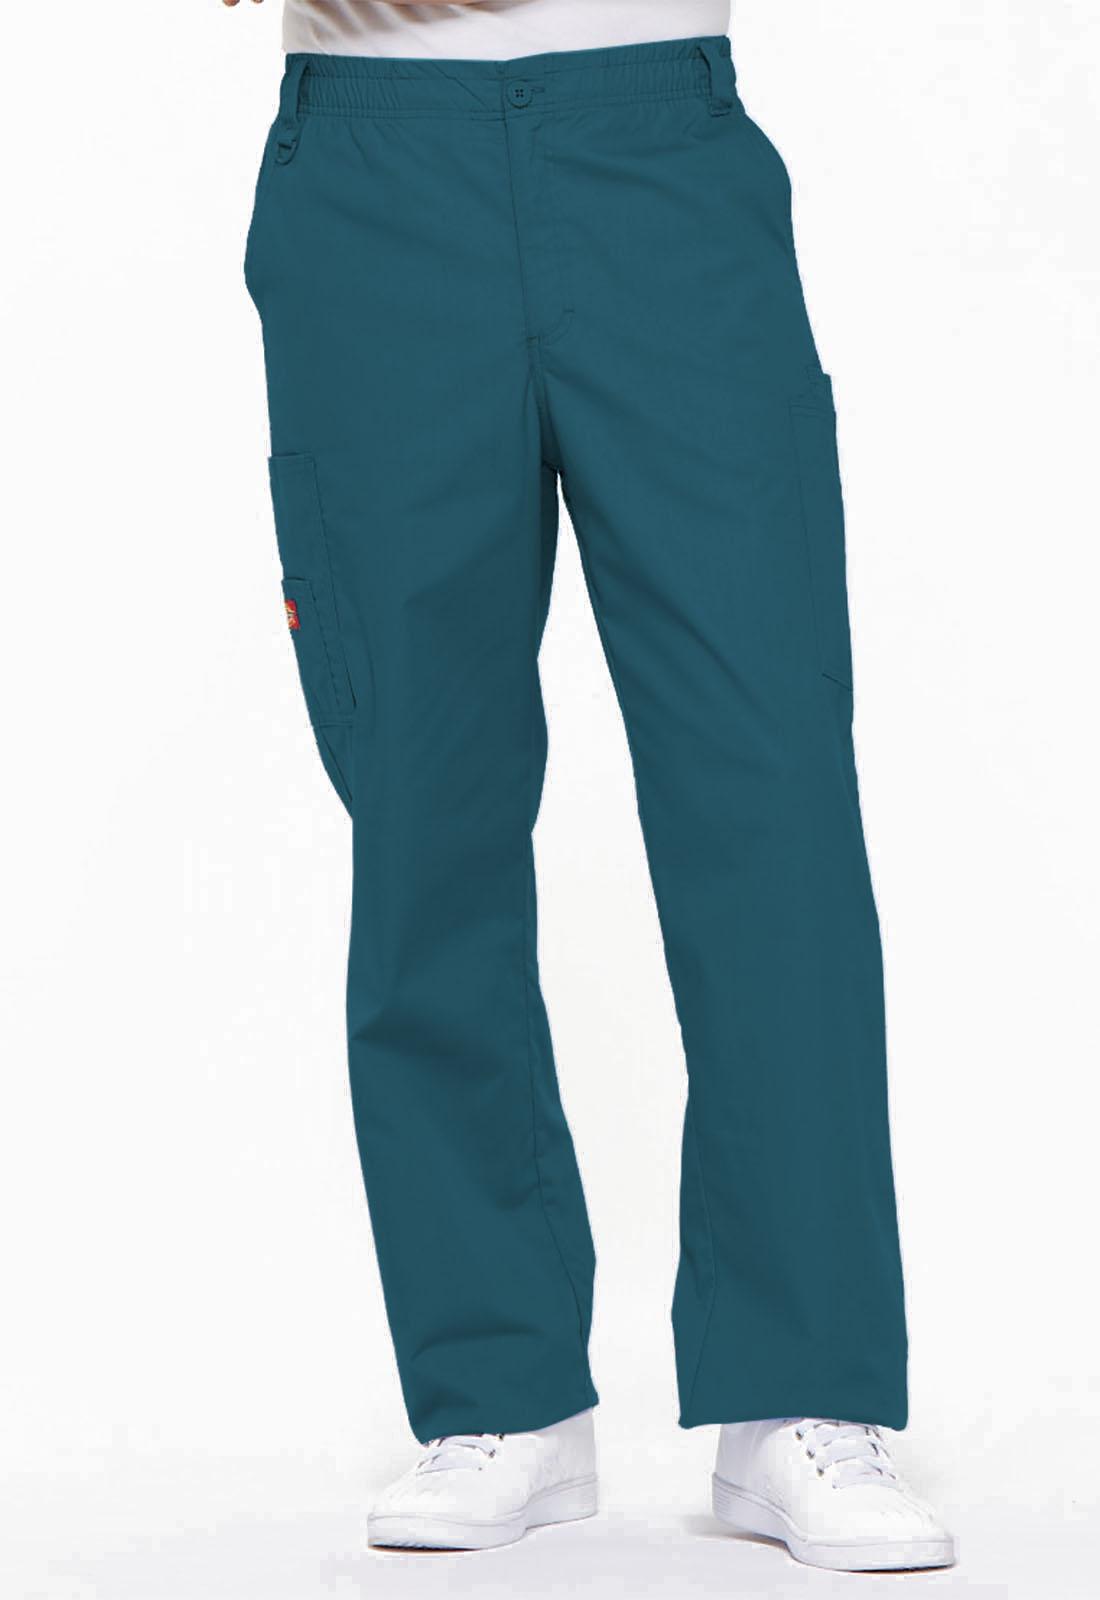 b734412e19e EDS Signature Men's Zip Fly Pull-On Pant in Caribbean Blue 81006 ...